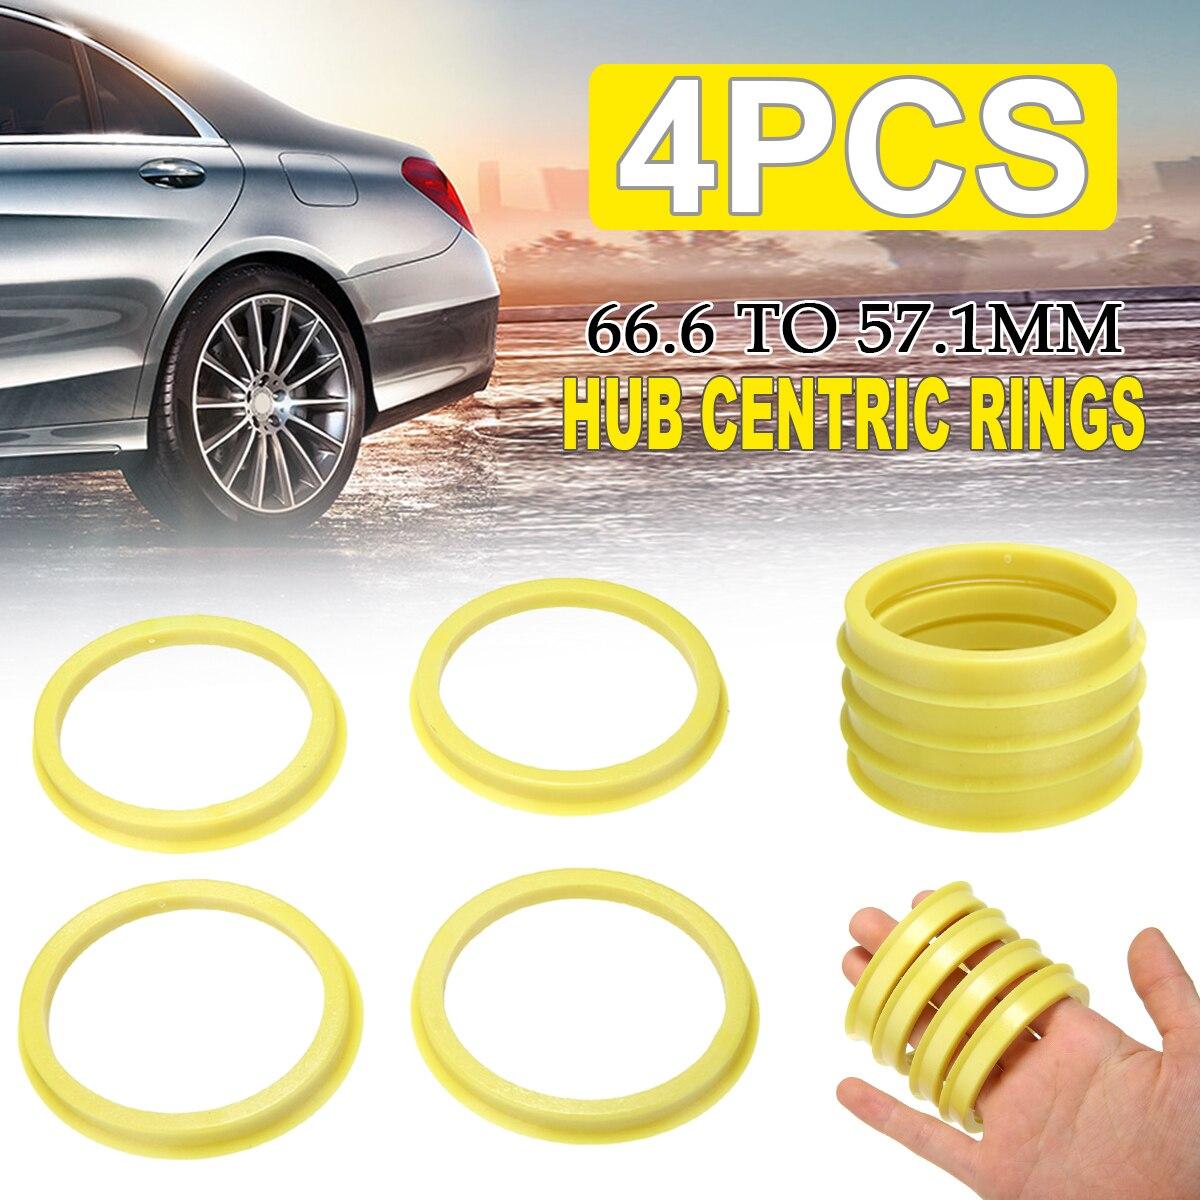 High Quality New Arrival For Audi Skoda 4pcs 66.6 To 57.1mm Wheel Center Collar Hub Centric Ring Modern Design